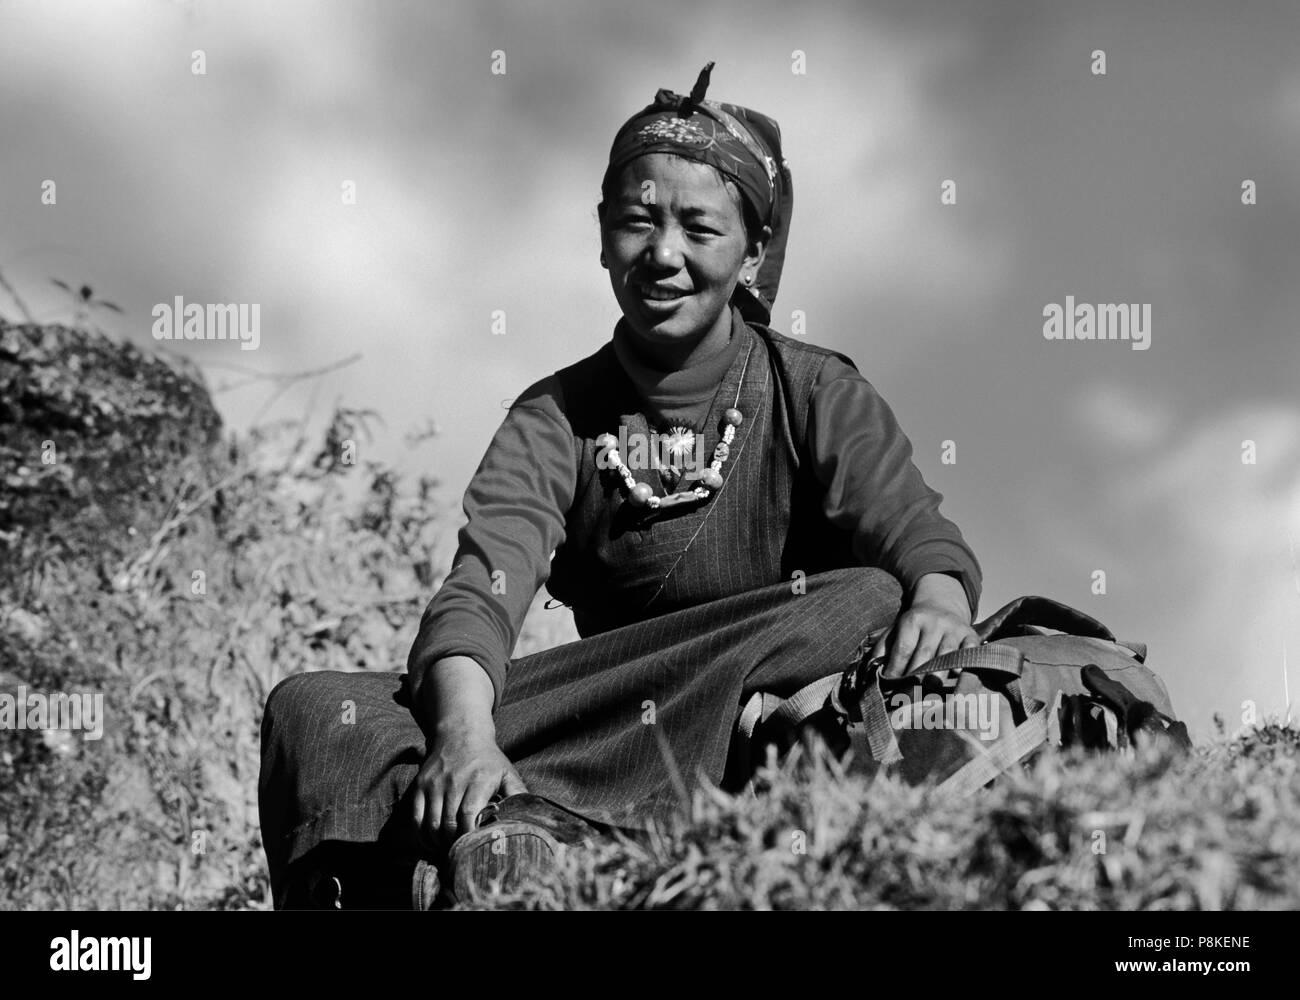 Sherpani woman in traditional dress - SIKLIS TREK, NEPAL Stock Photo